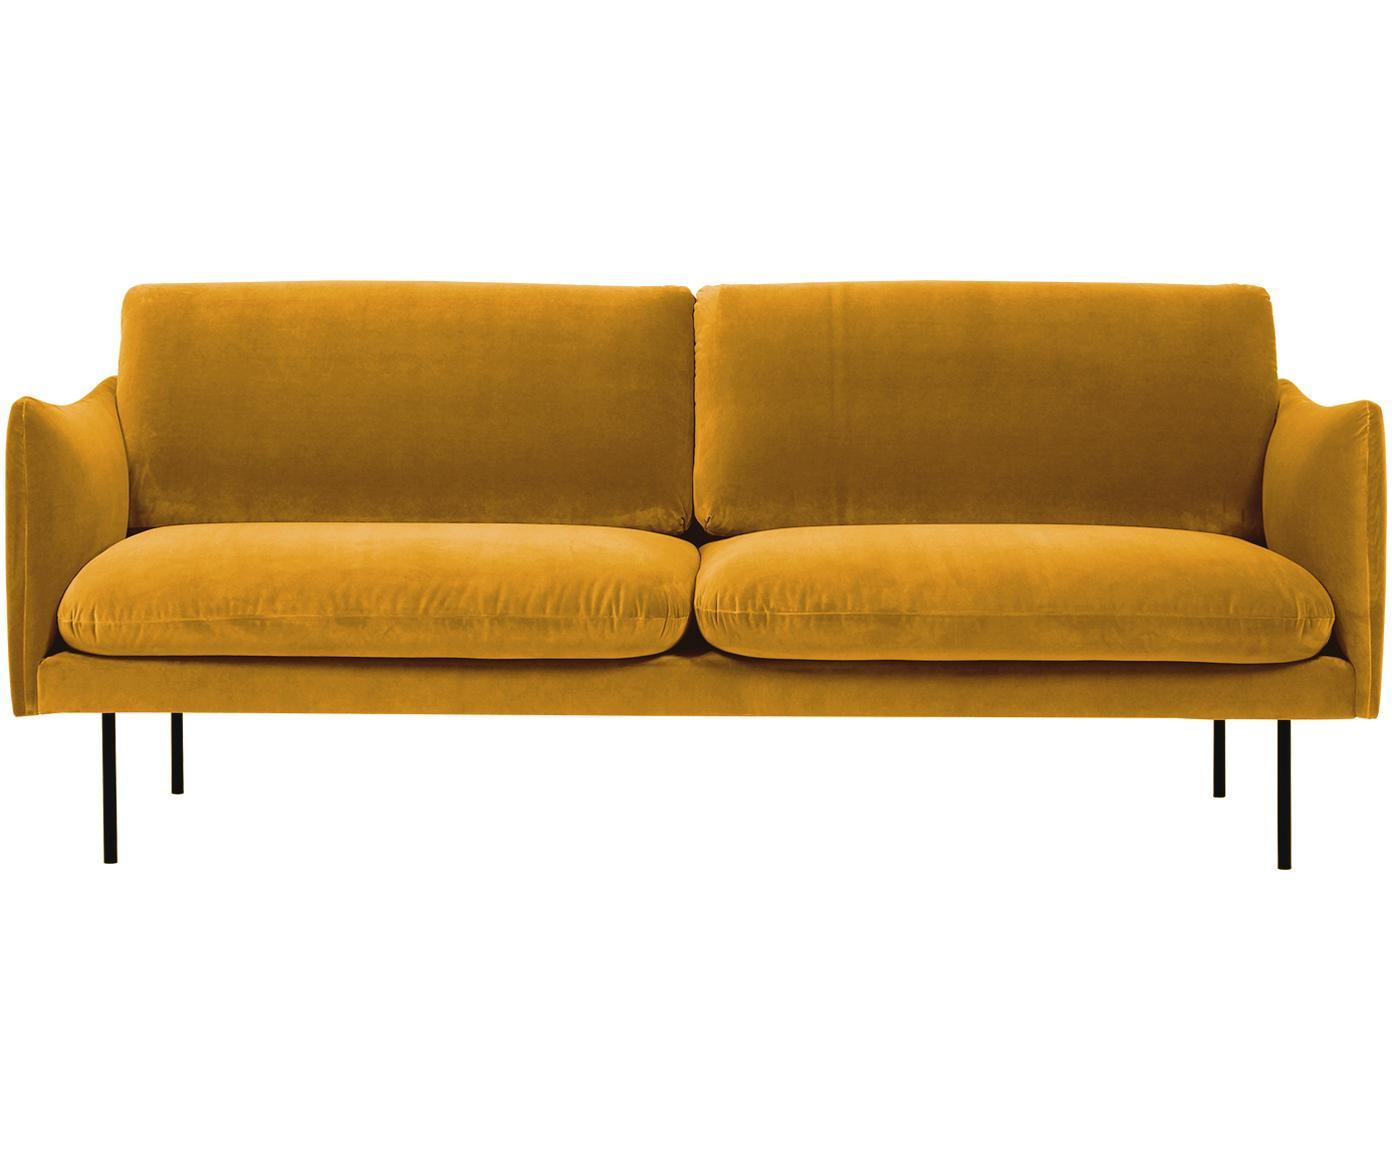 Samt-Sofa Moby (2-Sitzer), Bezug: Samt (Hochwertiger Polyes, Gestell: Massives Kiefernholz, Samt Senfgelb, B 170 x T 95 cm